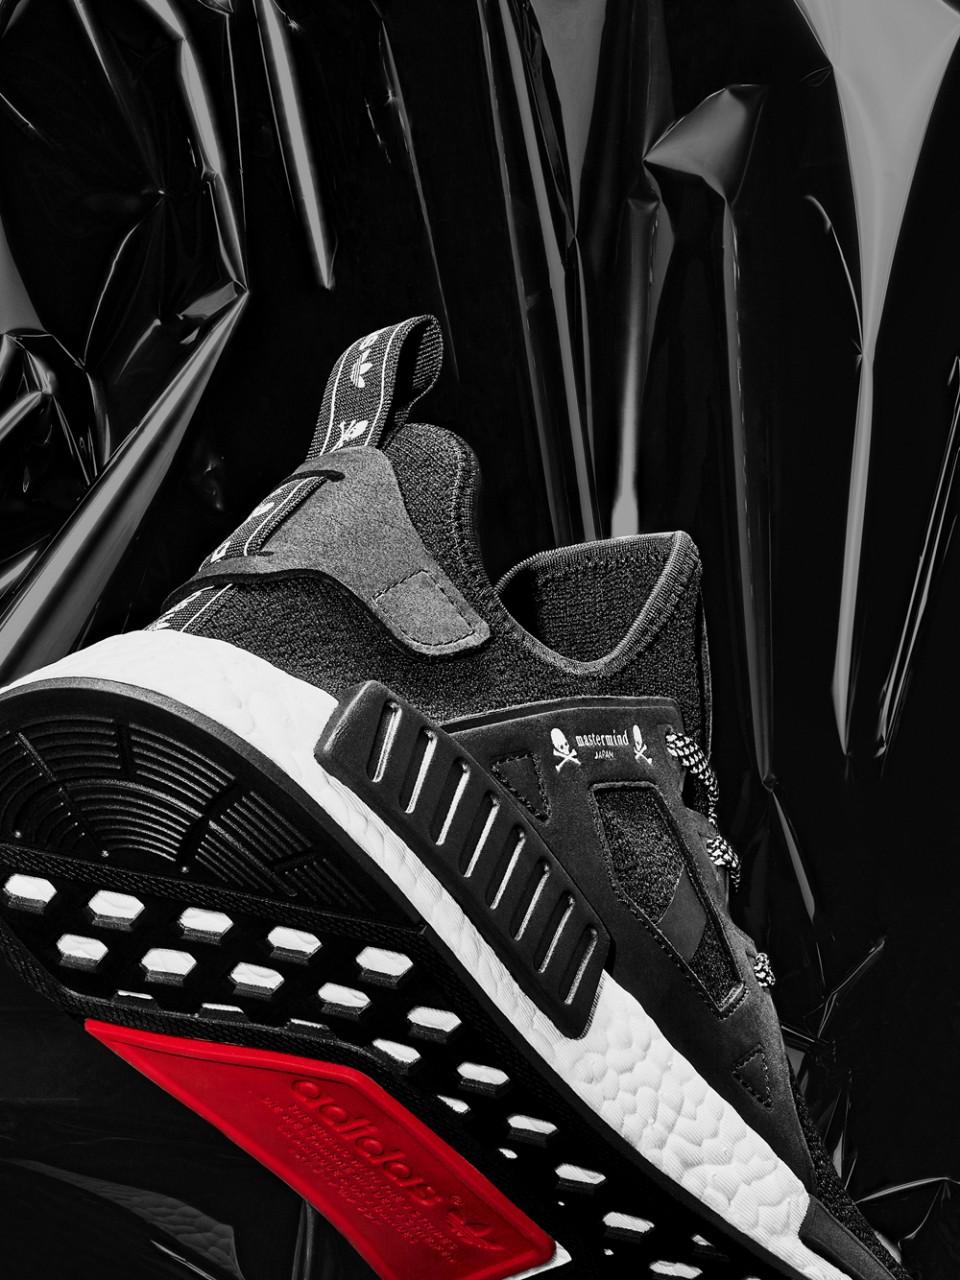 adidas originals x mastermind japan MMJ_NMD_R1